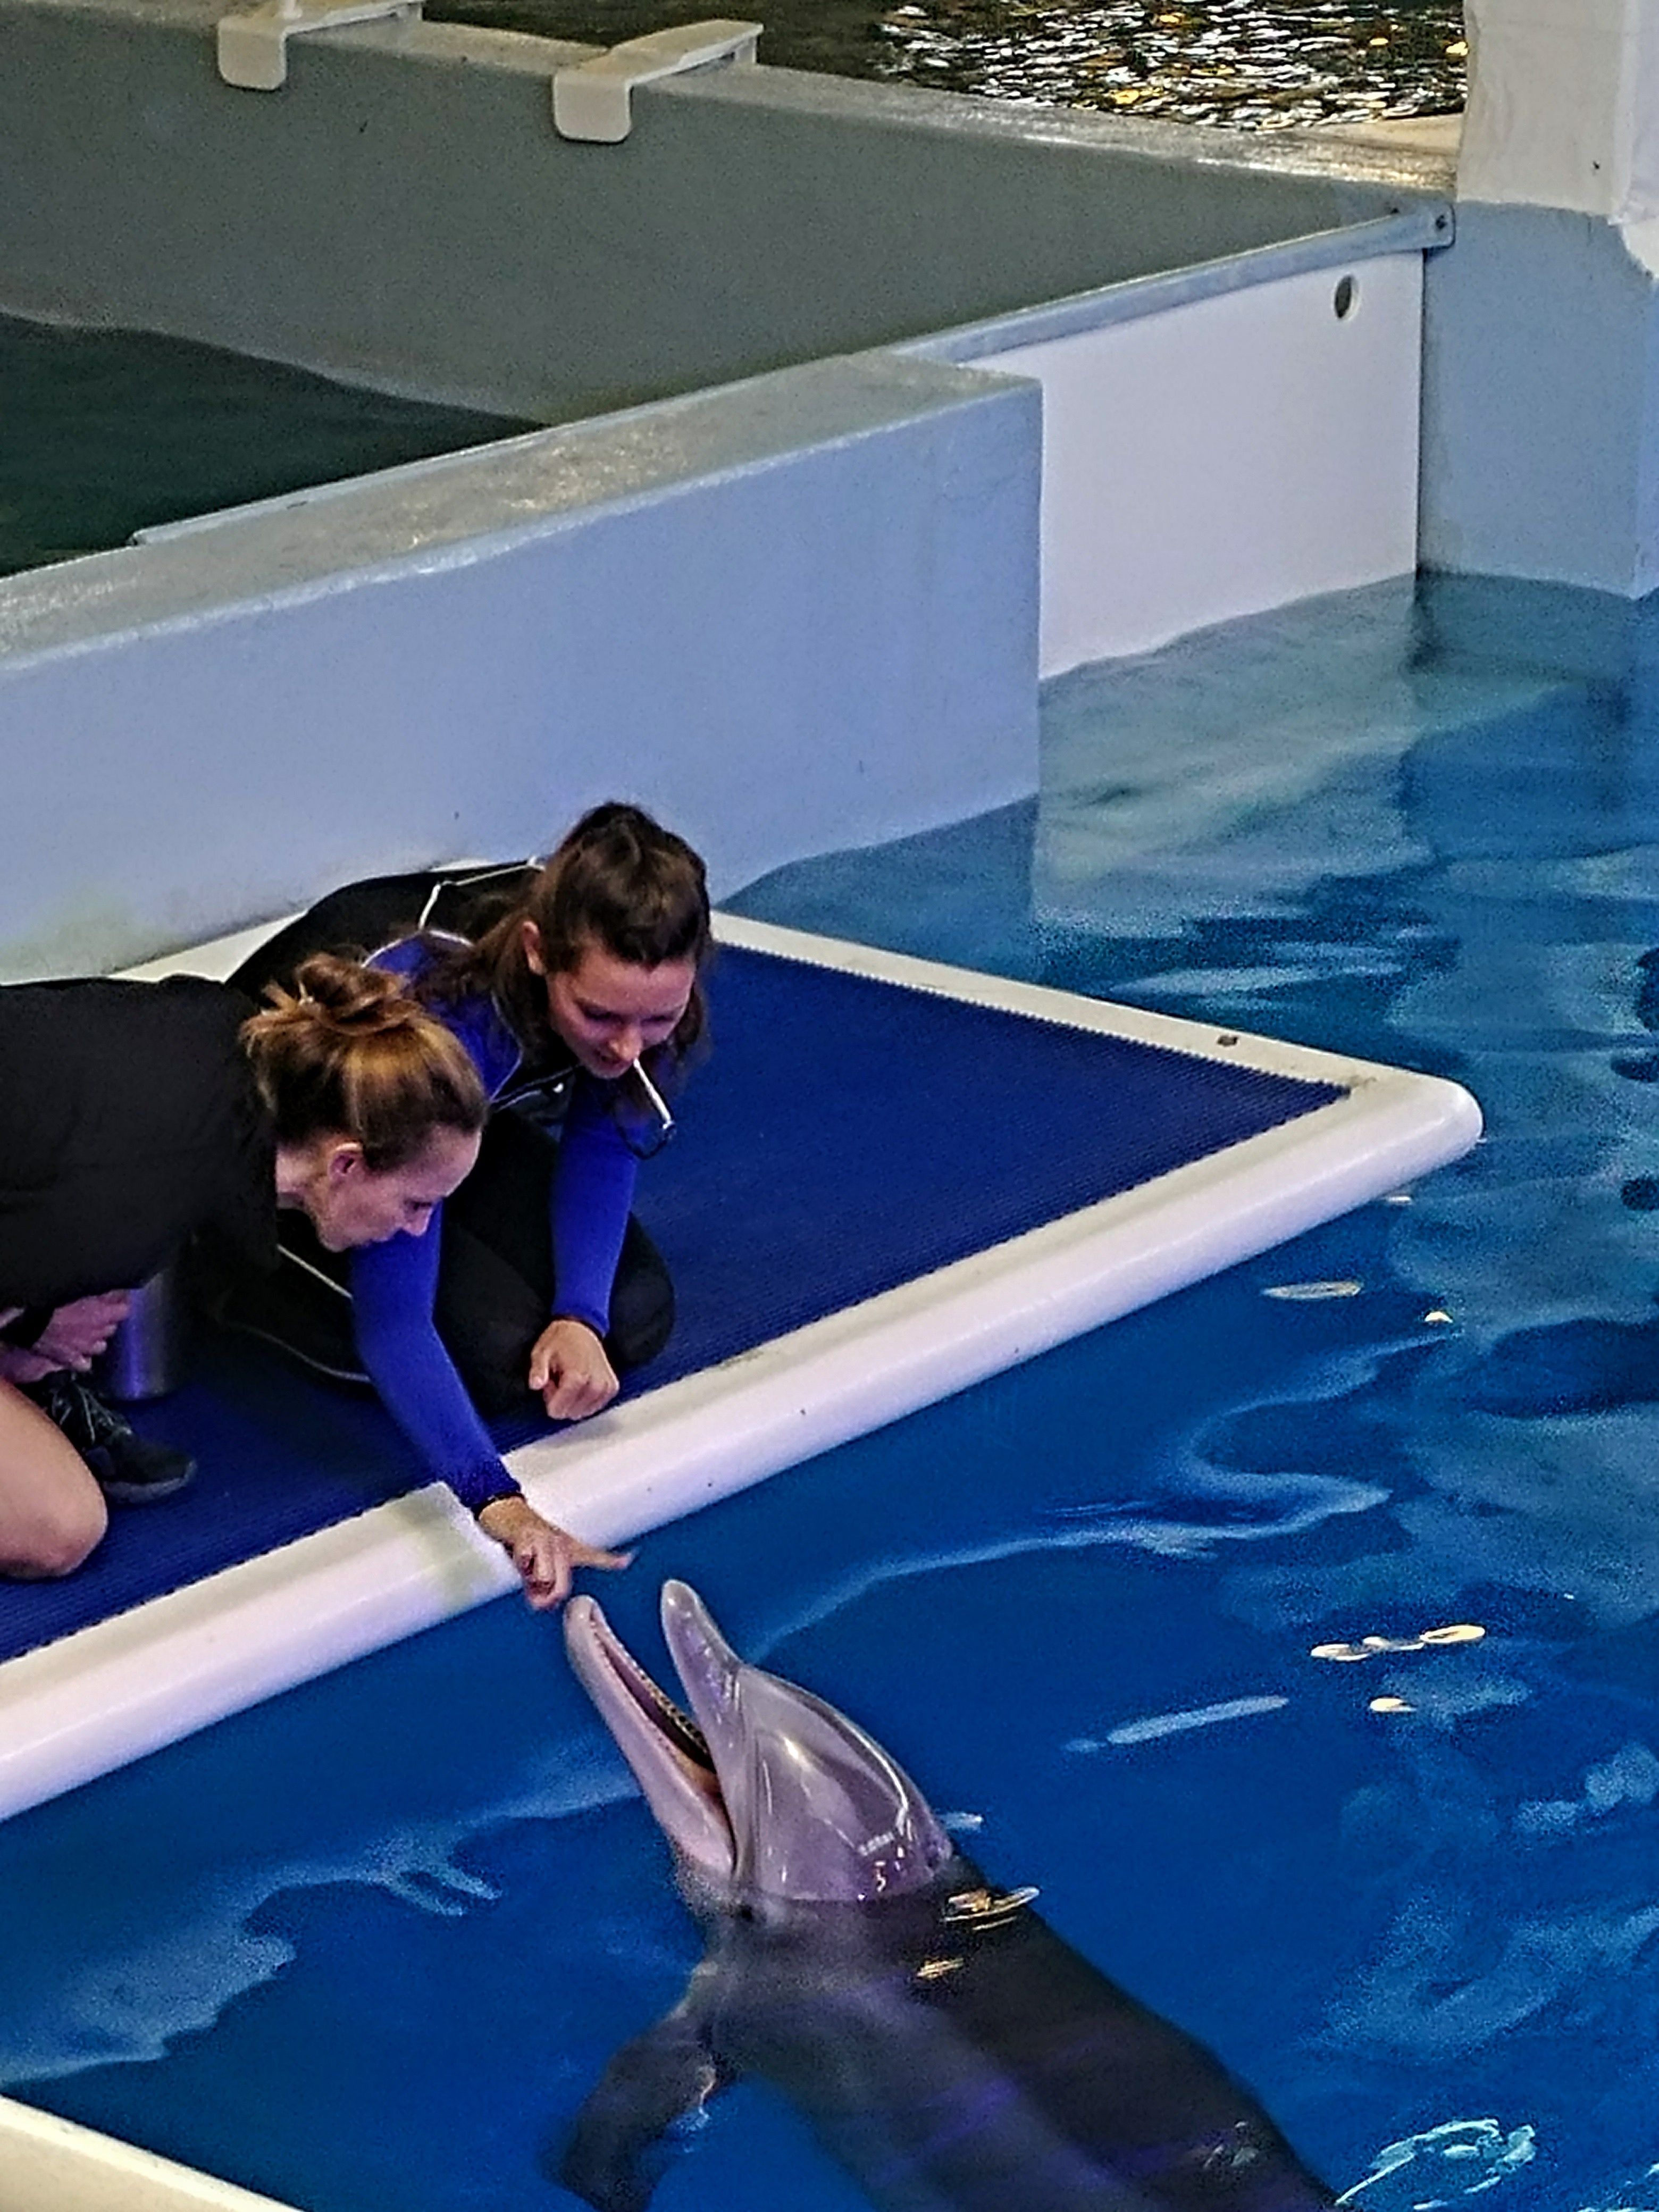 Clearwater Marine Aquarium, Clearwater, Florida